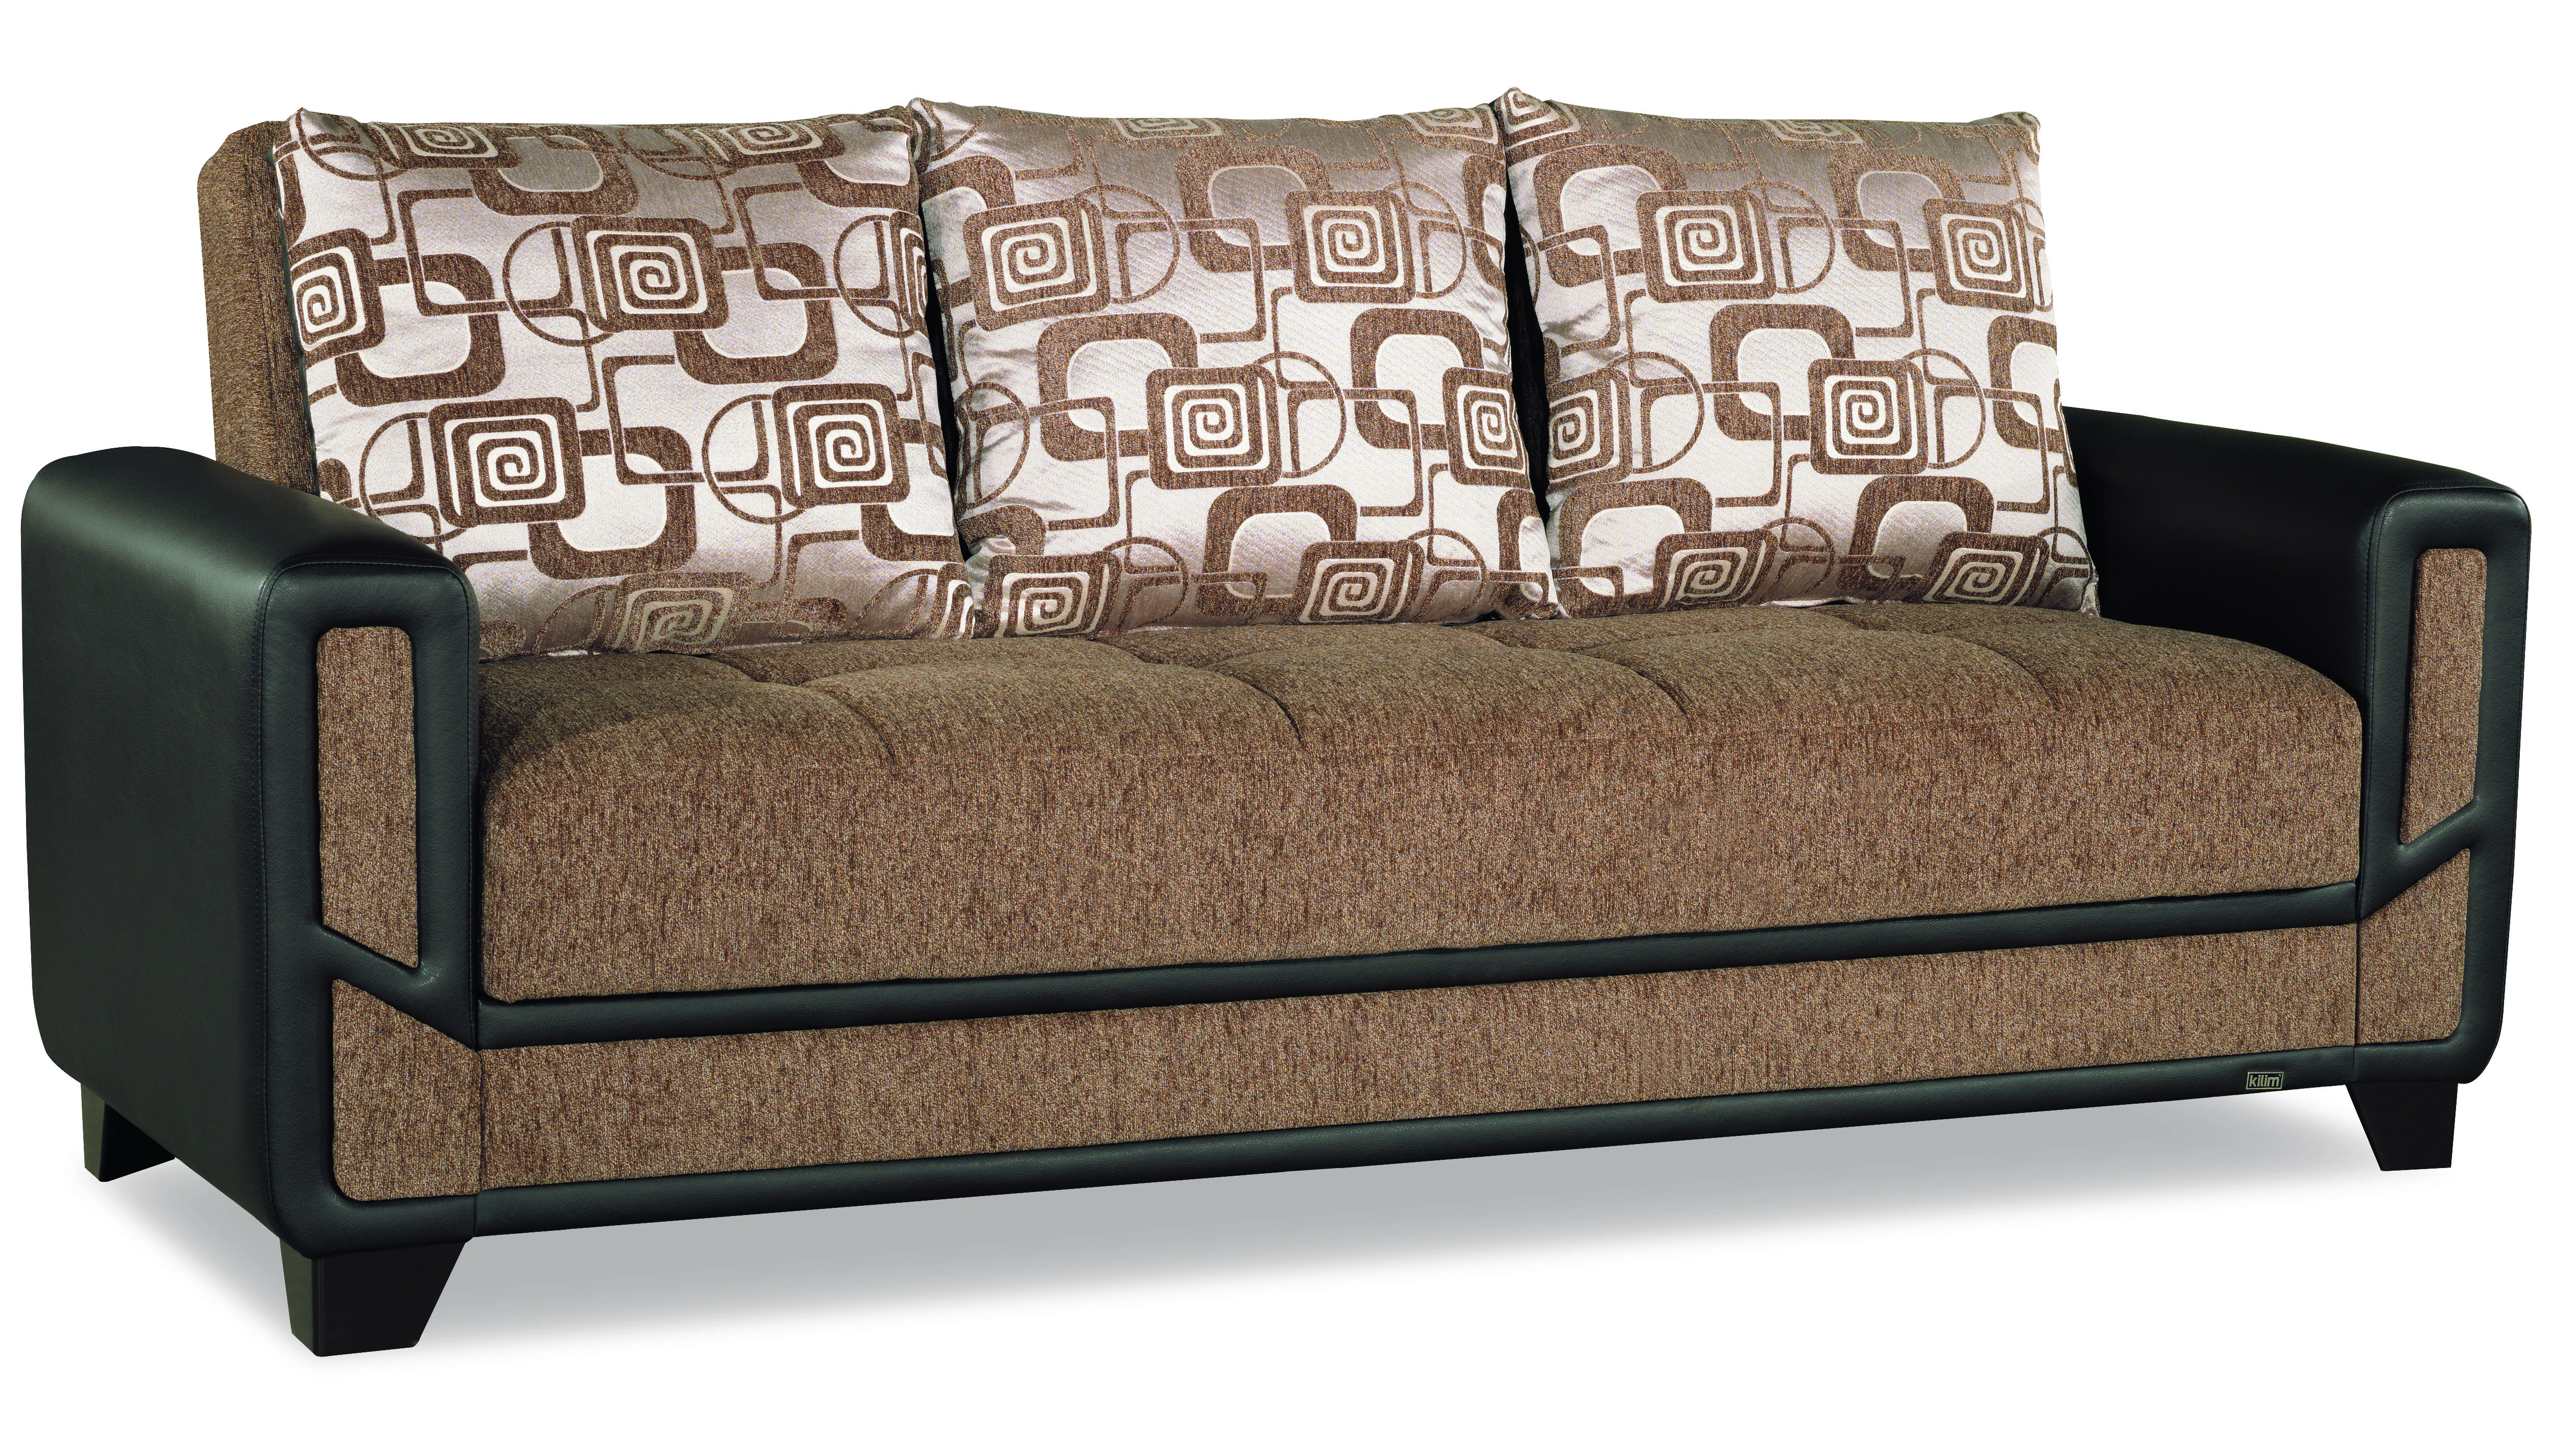 Prime Mondo Modern Sofa Brown Inzonedesignstudio Interior Chair Design Inzonedesignstudiocom